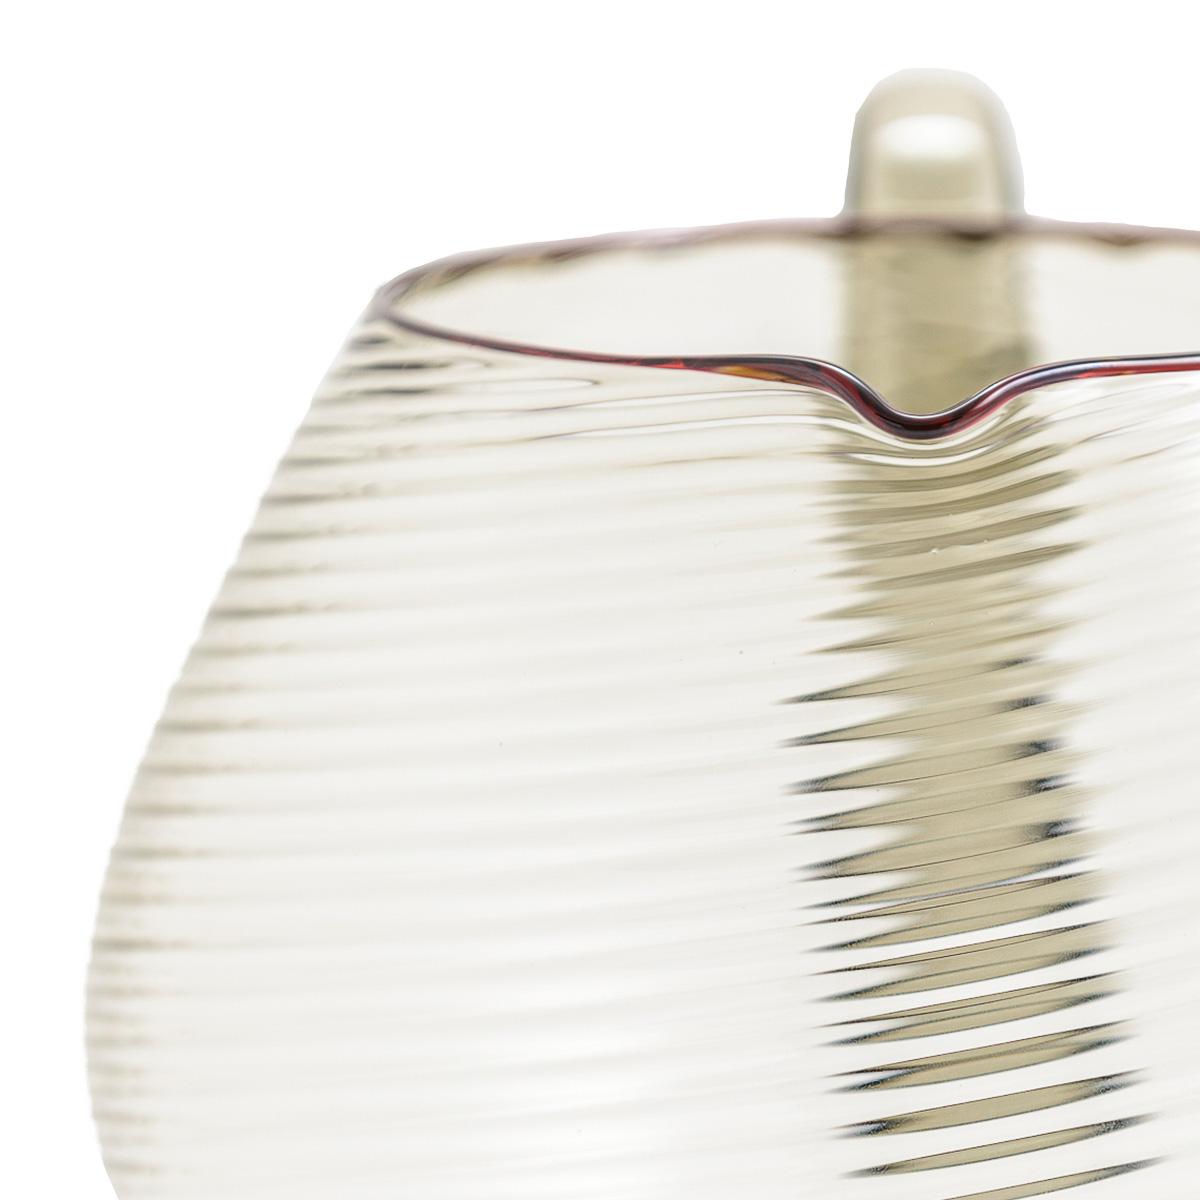 palla-jug-riga-mena-murano-glass-design-giberto-luxury-water-detail